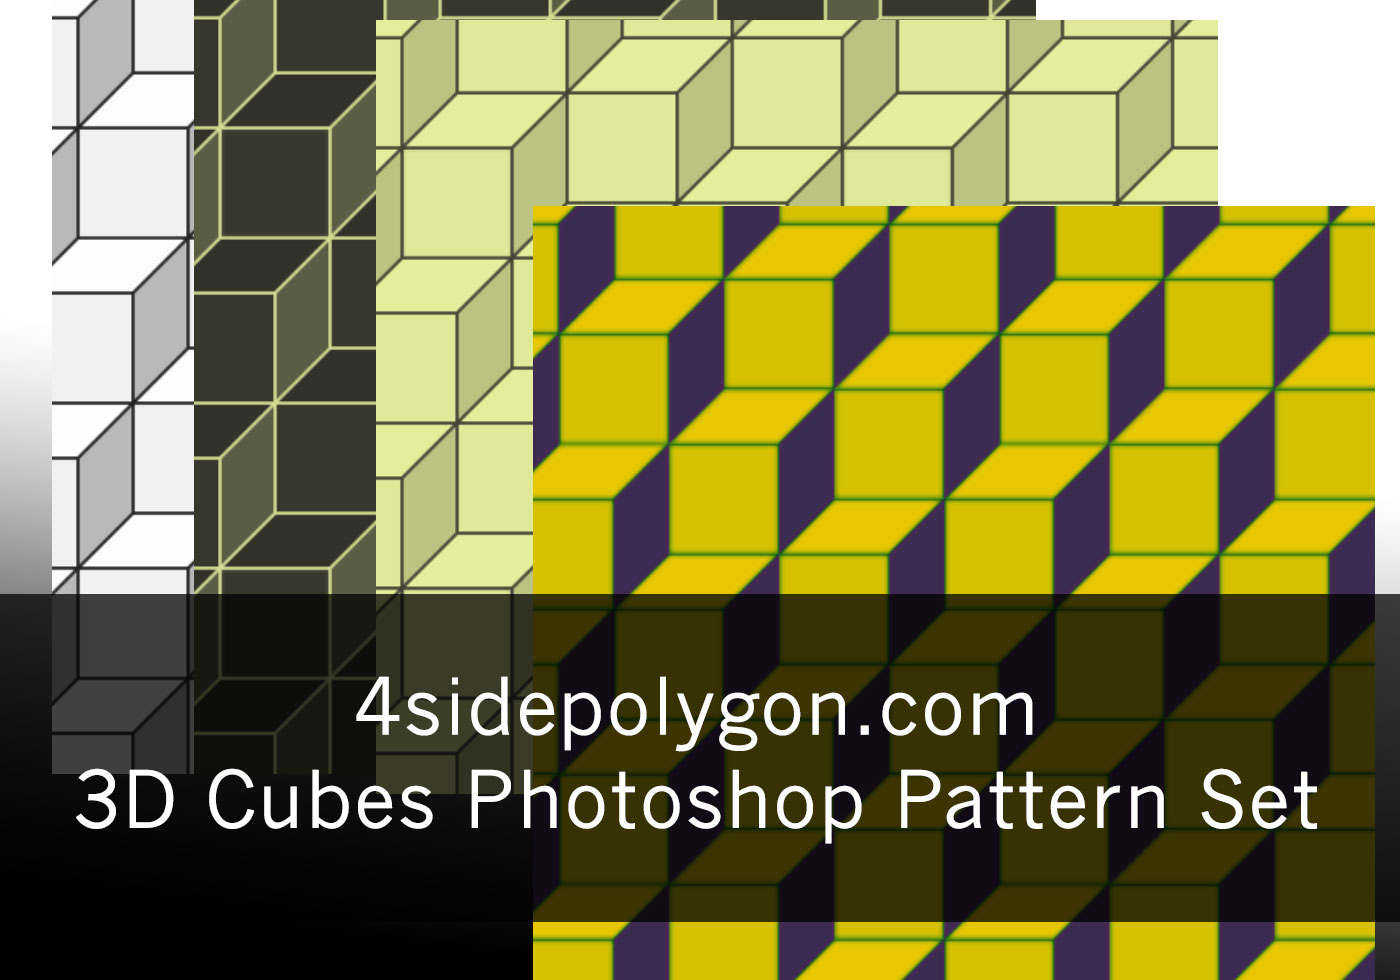 3D Cube Patterns - Free Photoshop Brushes at Brusheezy!